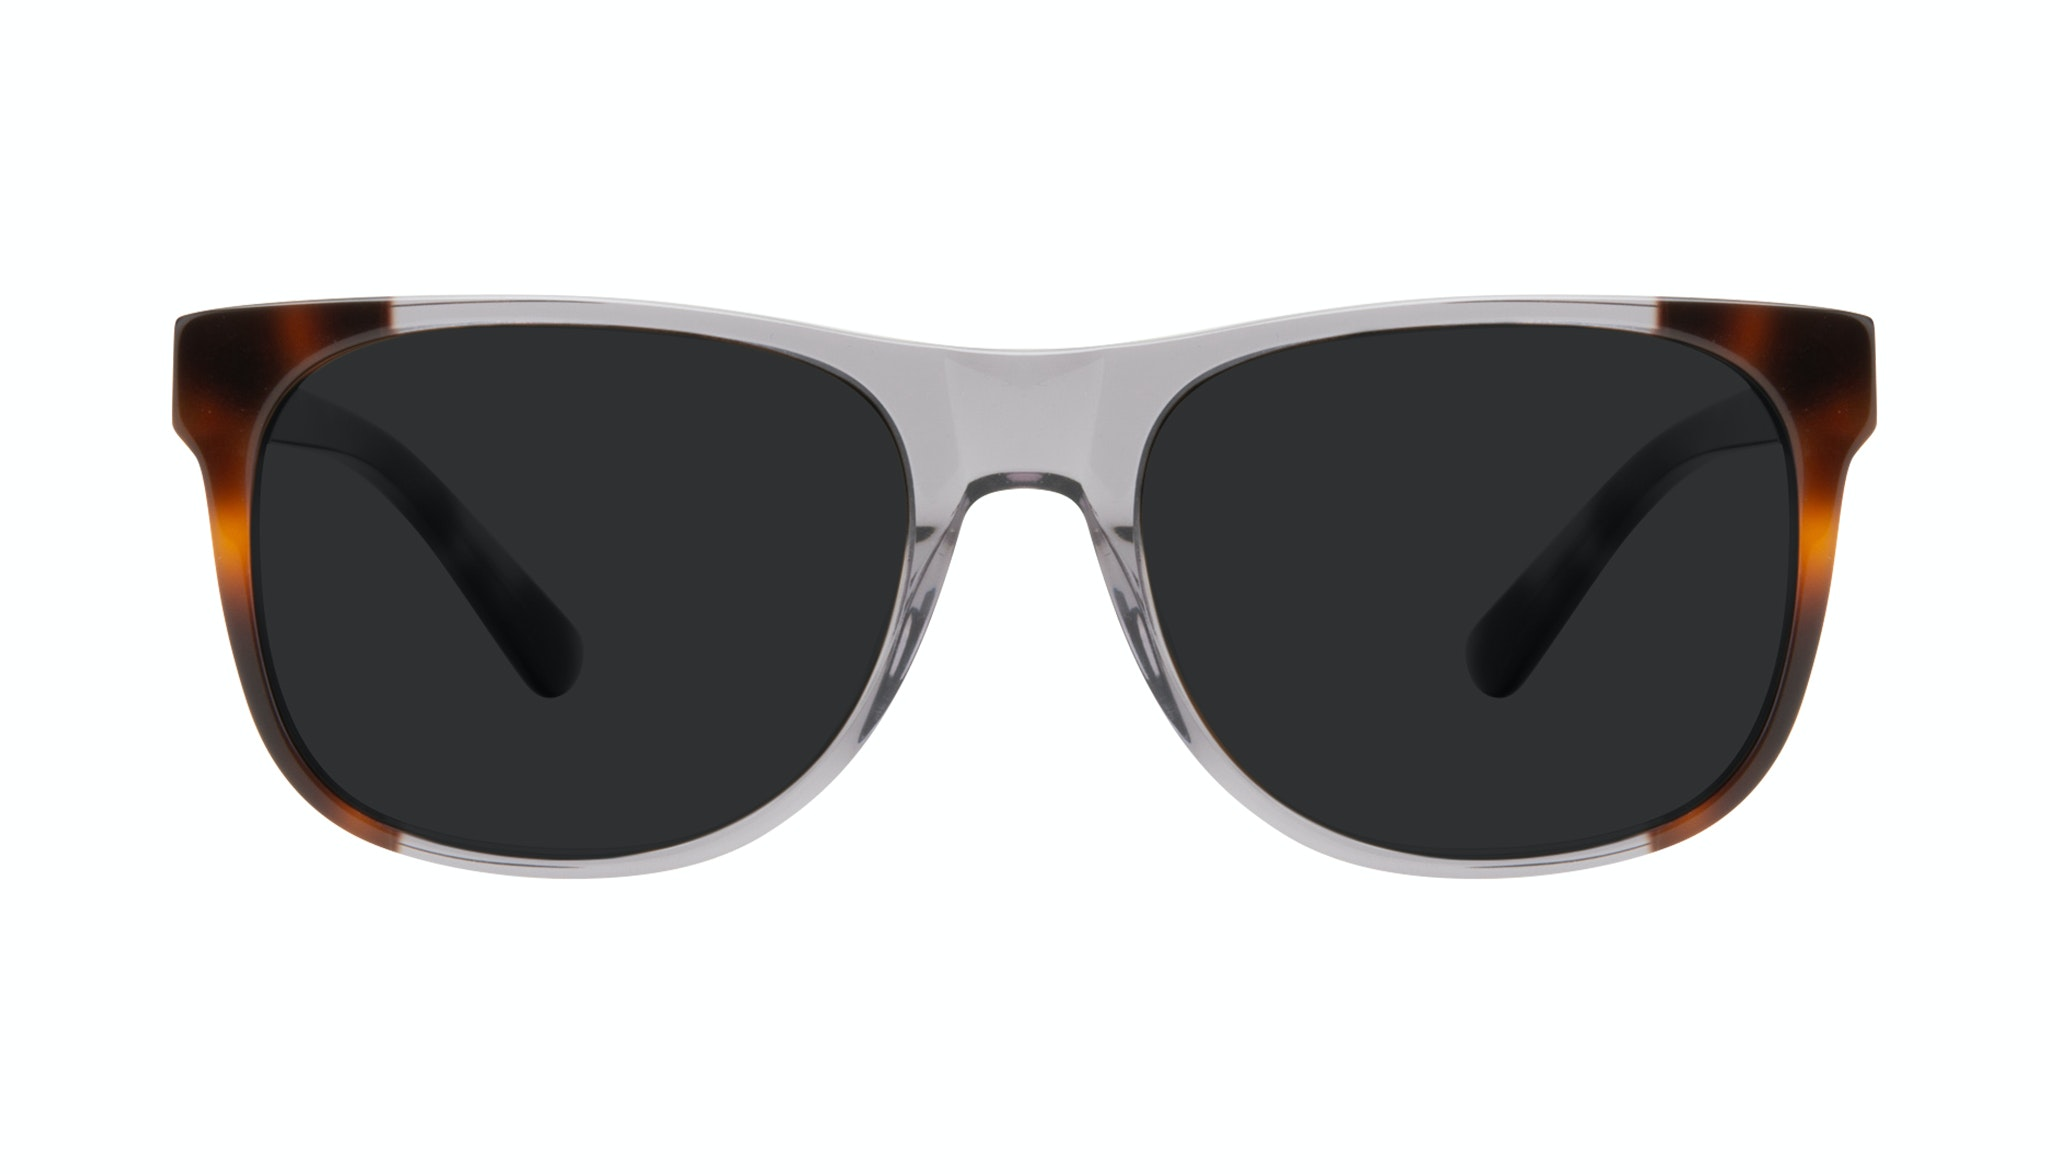 Affordable Fashion Glasses Square Sunglasses Men Make Smokey Tort Front